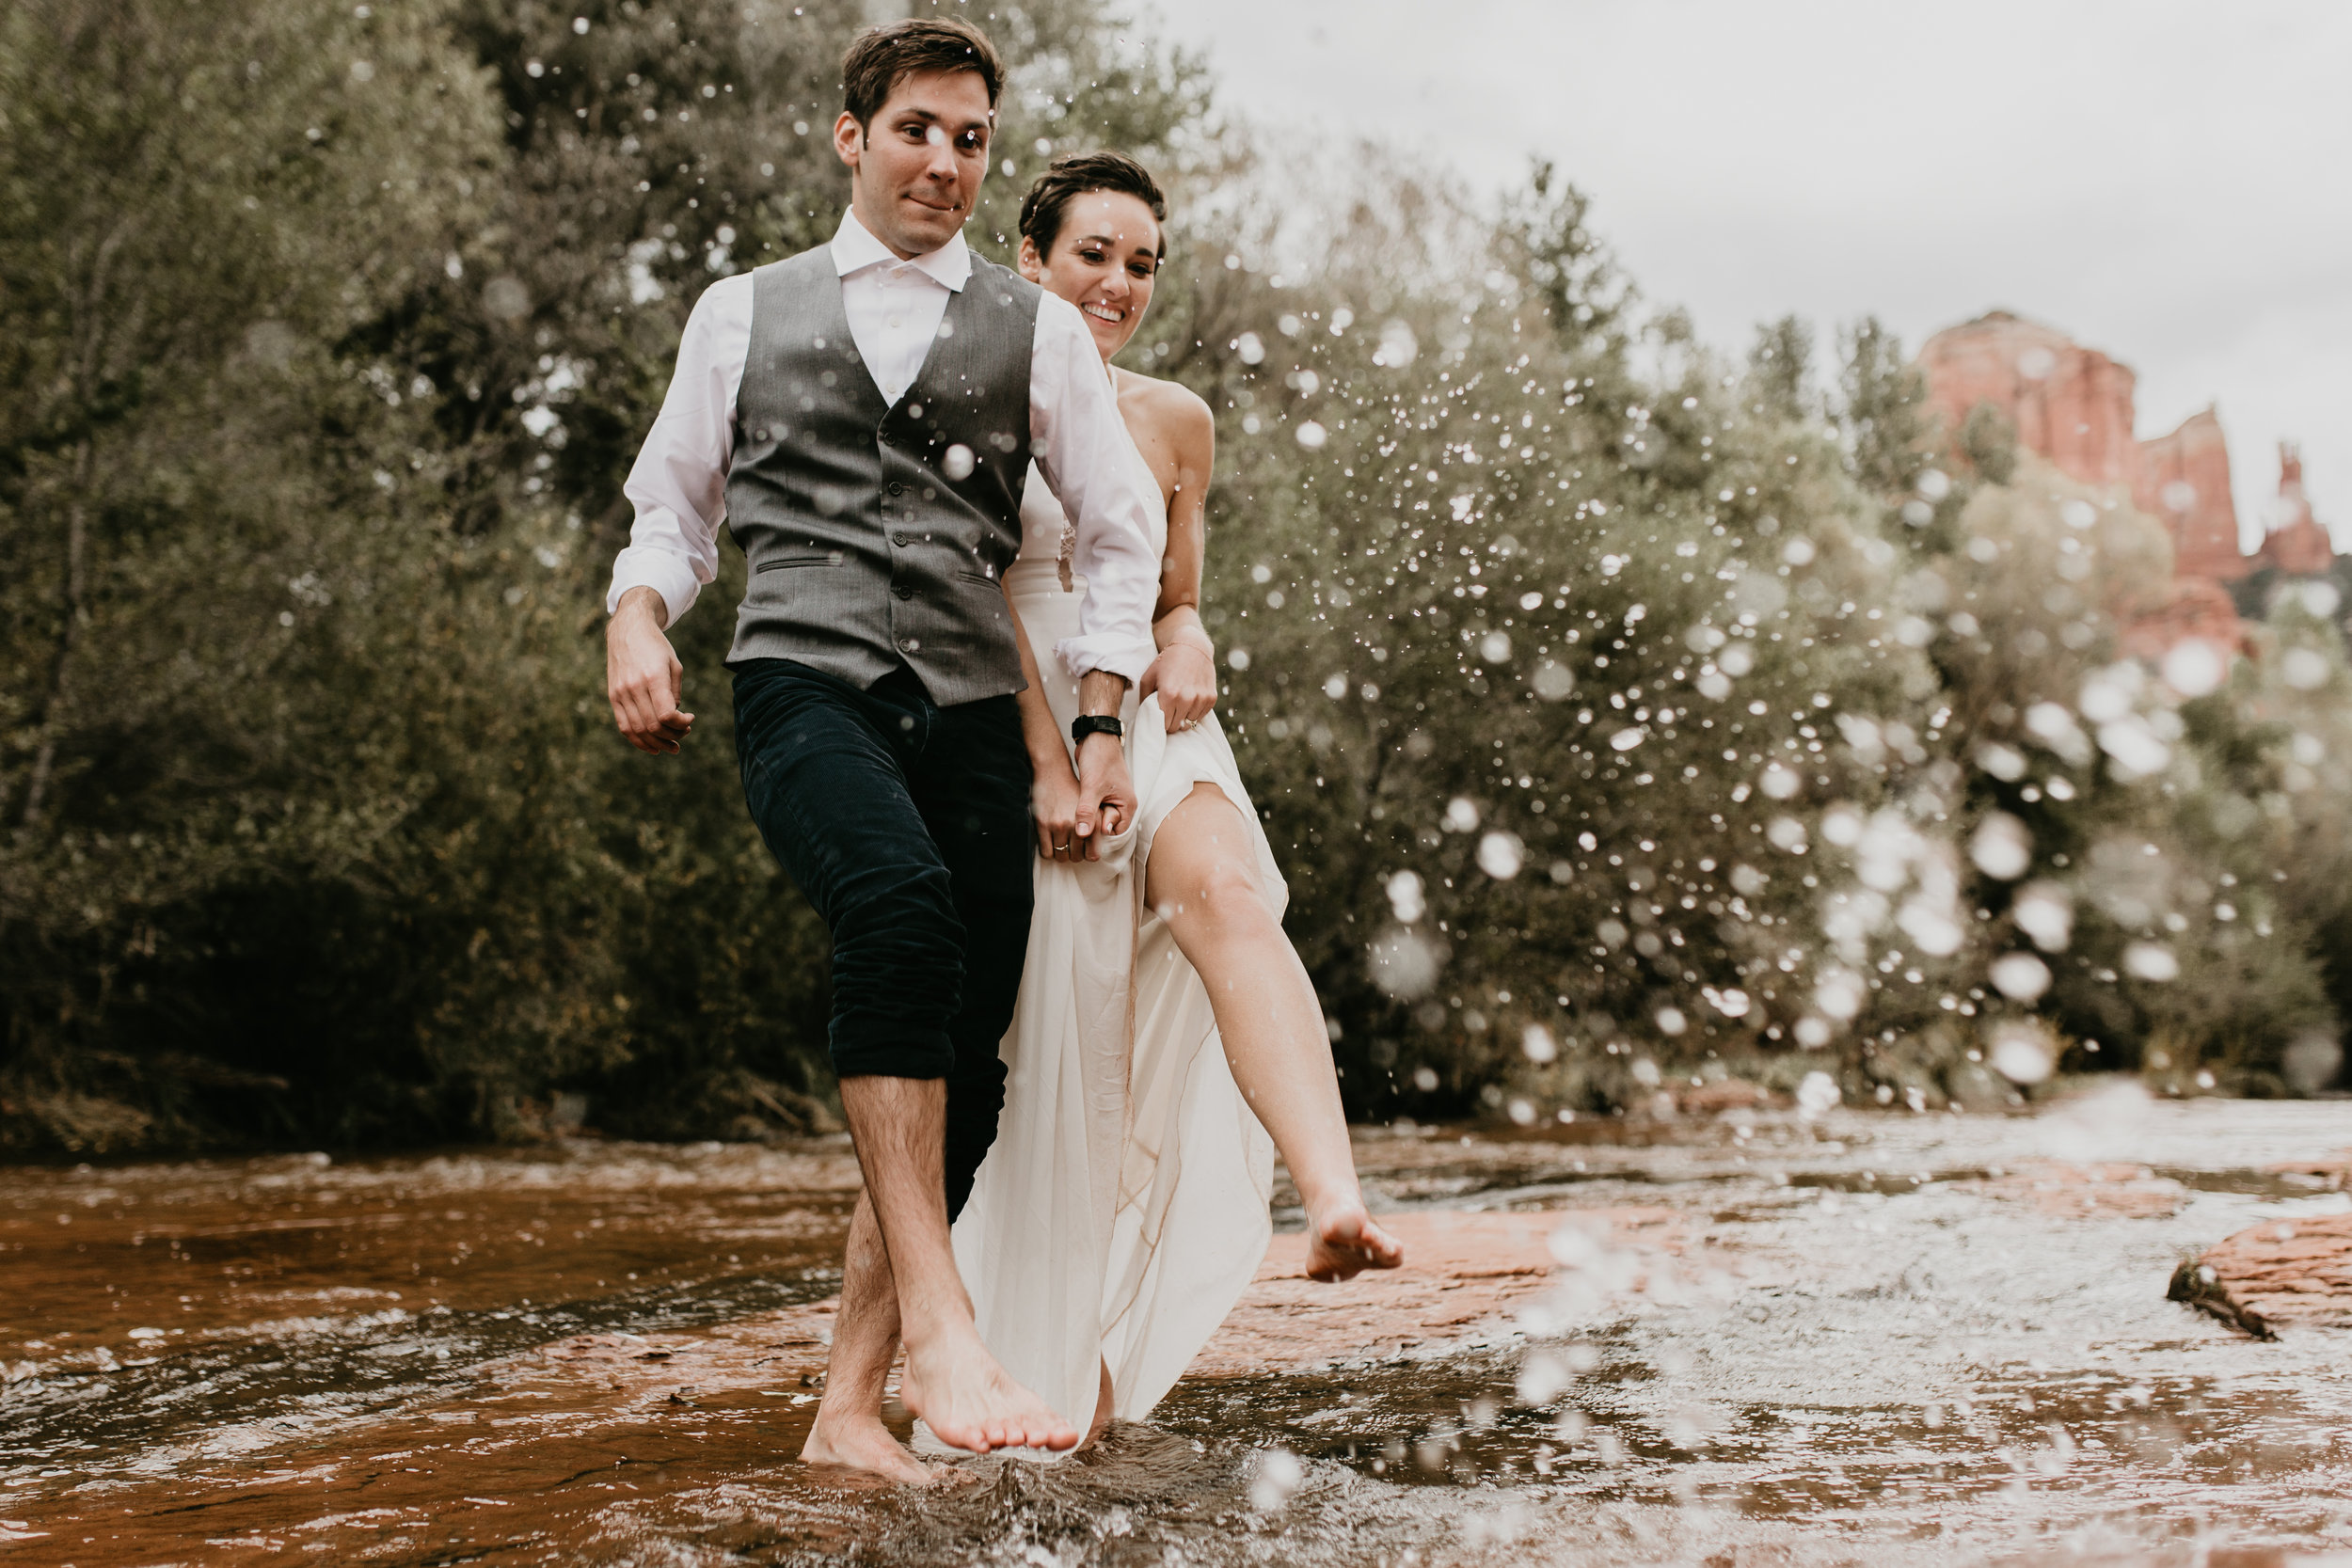 nicole-daacke-photography-sedona-arizona-destination-elopement-wedding-photographer-catherdral-rock-hiking-elopement-sedona-river-elopement-photos-desert-rock-wedding-photographer-laid-back-spontaneous-elopement-118.jpg